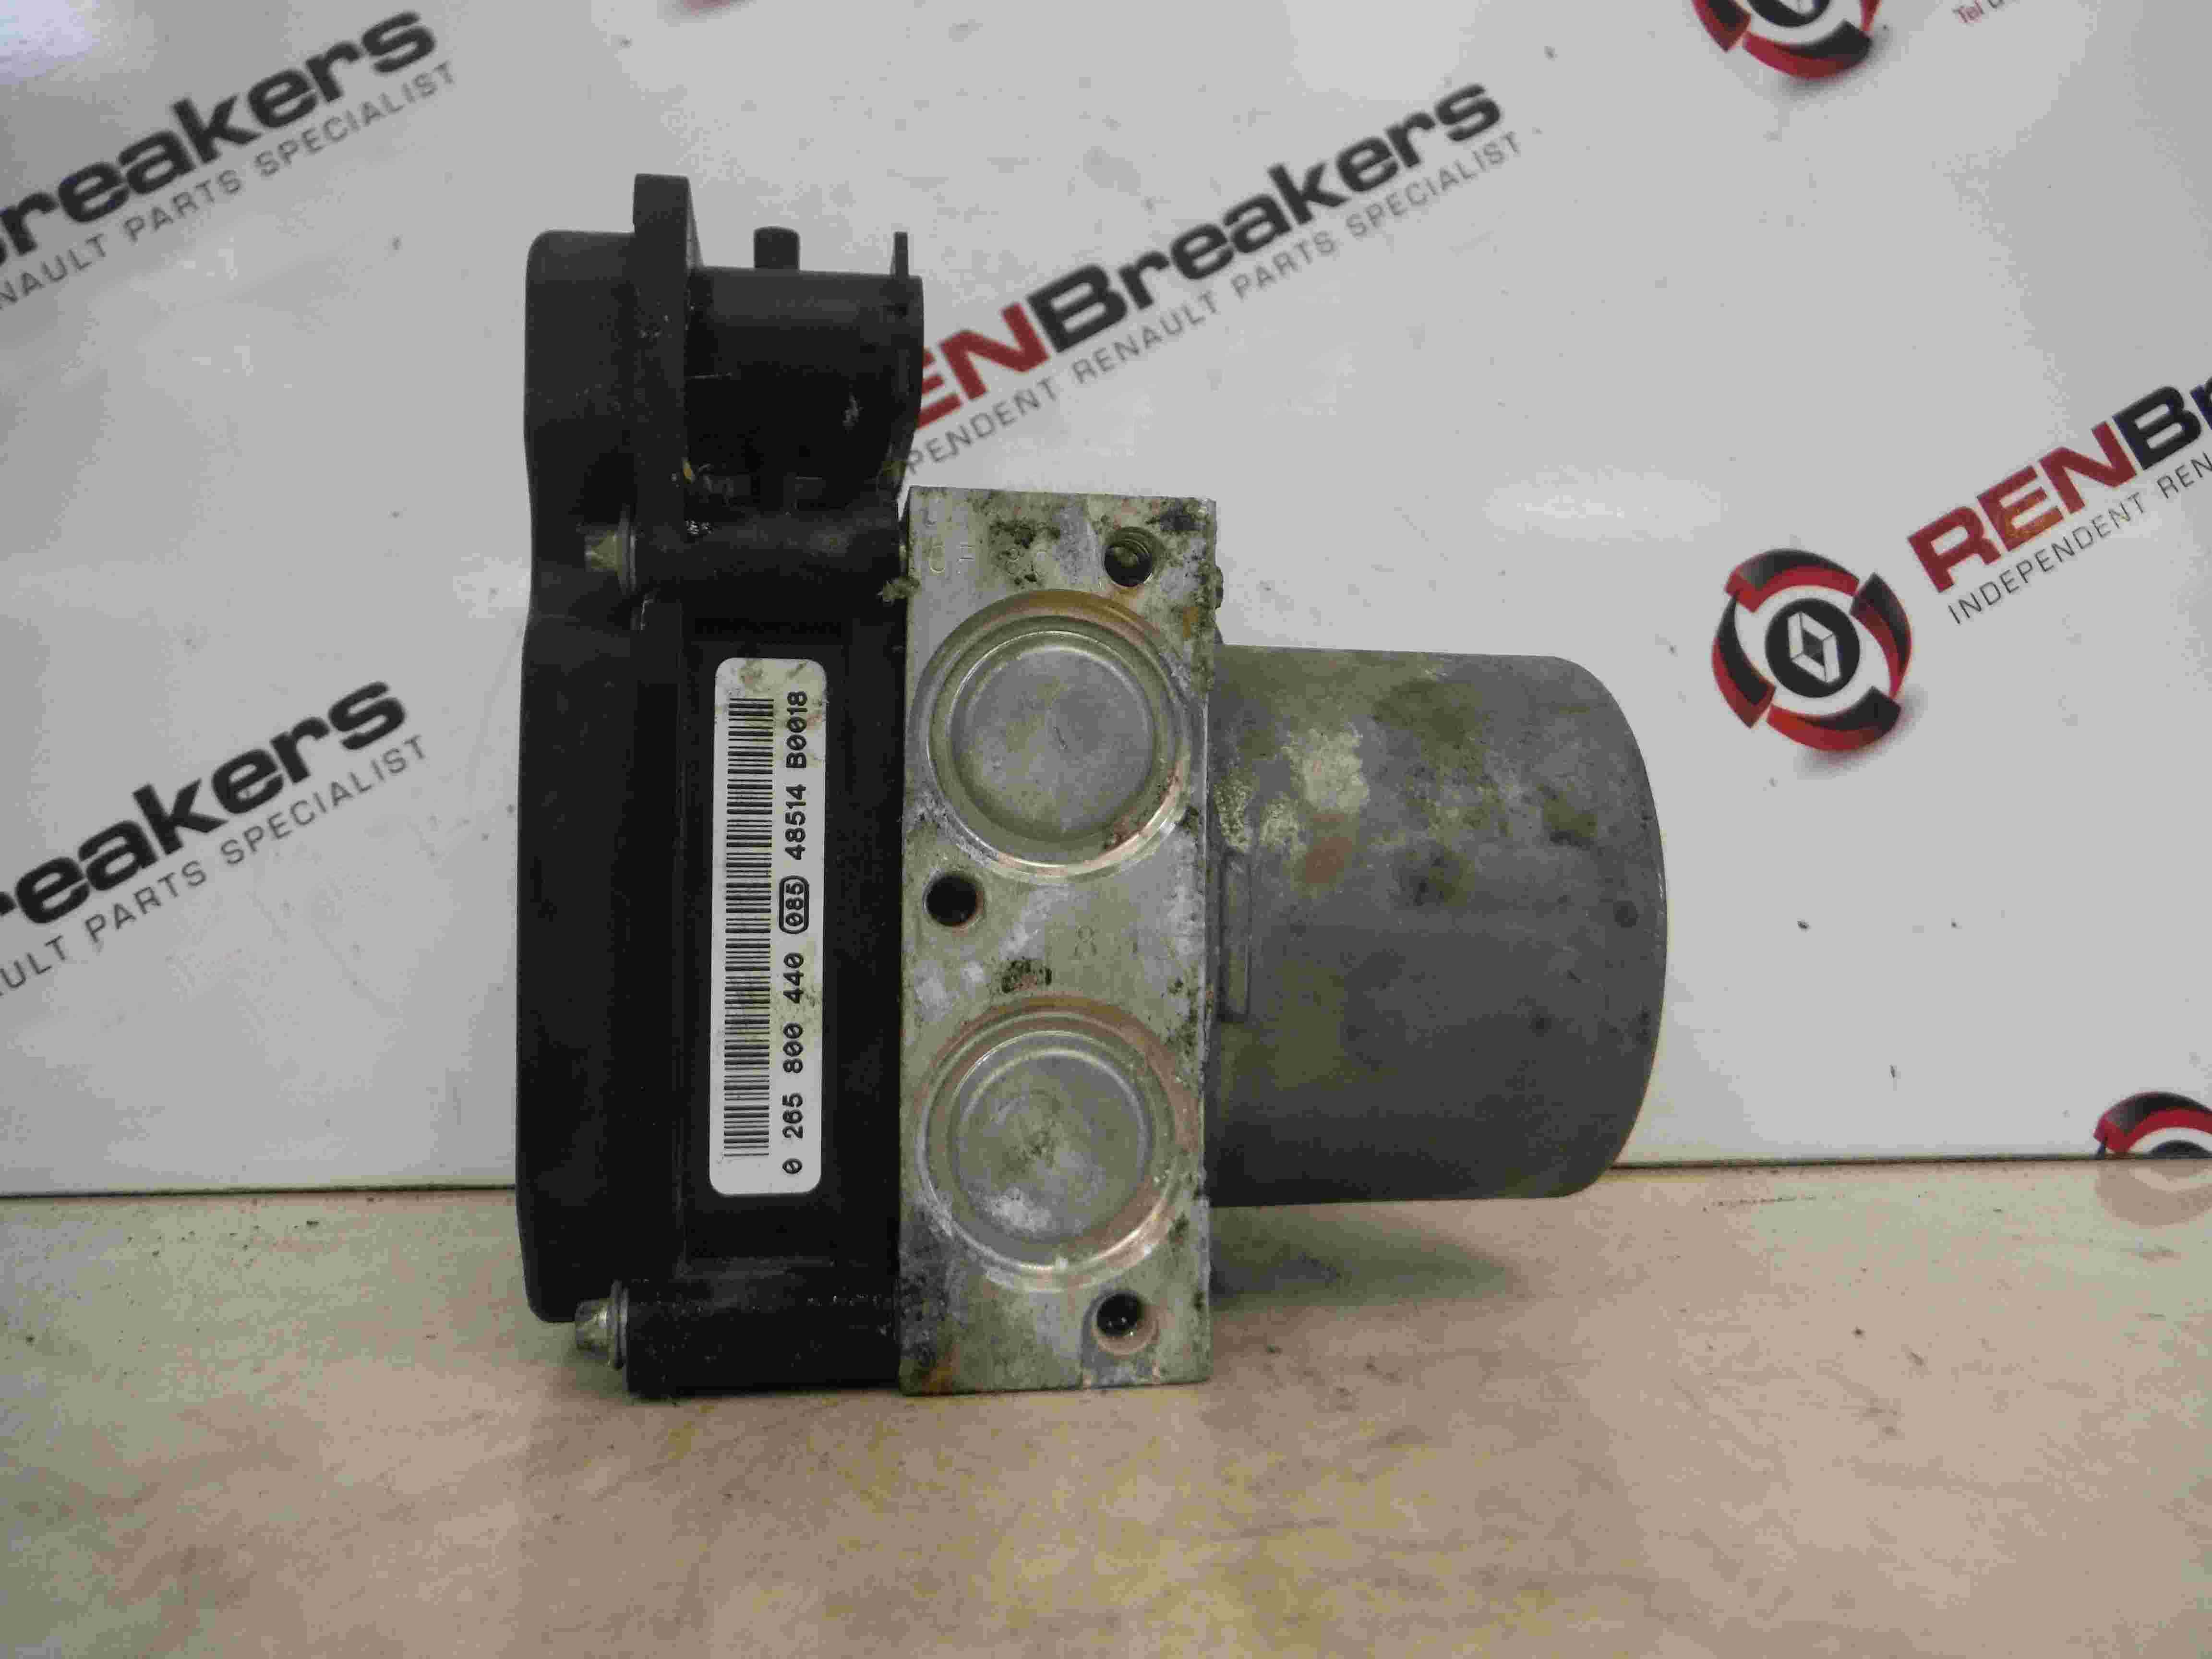 Renault SCENIC 2003-2013 ABS PUMP Compressor Unit 8200737985